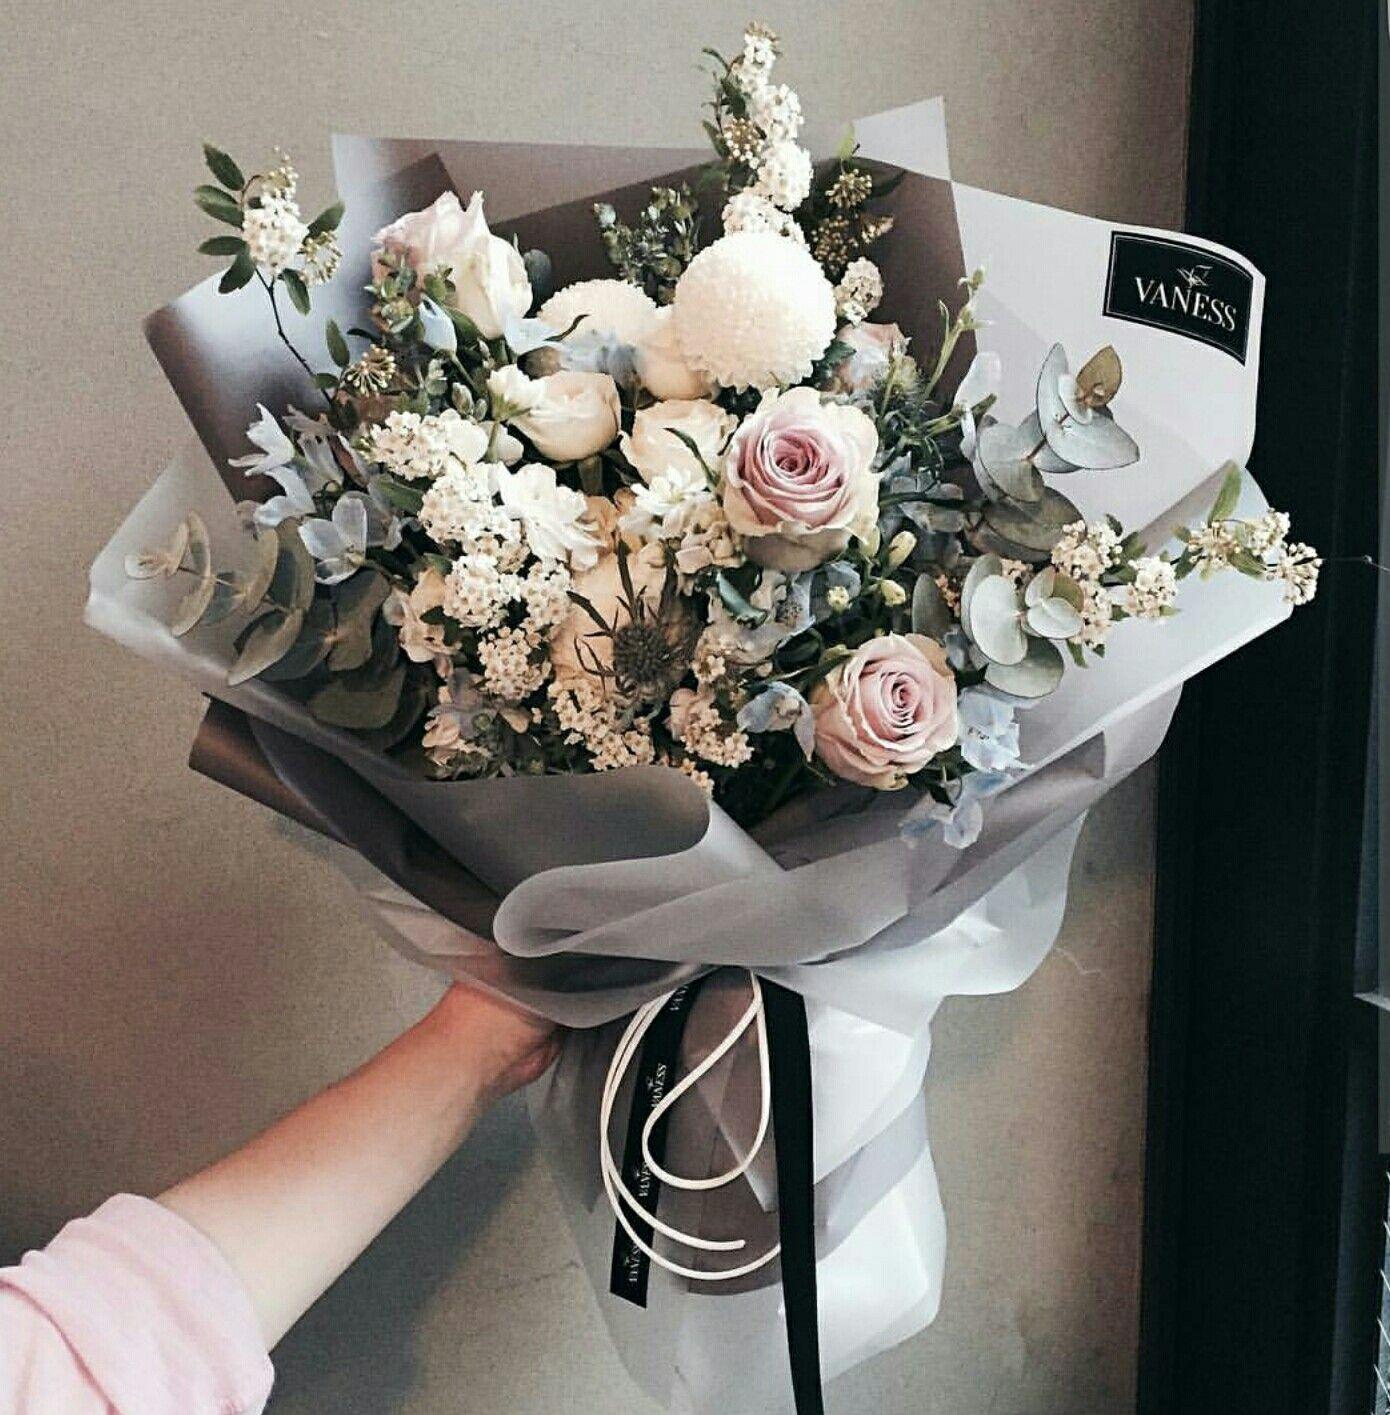 Http Tokobungabekasiaakflorist Blogspot Co Id 2016 10 Toko Bunga Di Bekasi 24 Jam Bekasi Html Composizioni Floreali Bouquet Floreali Mazzo Di Fiori